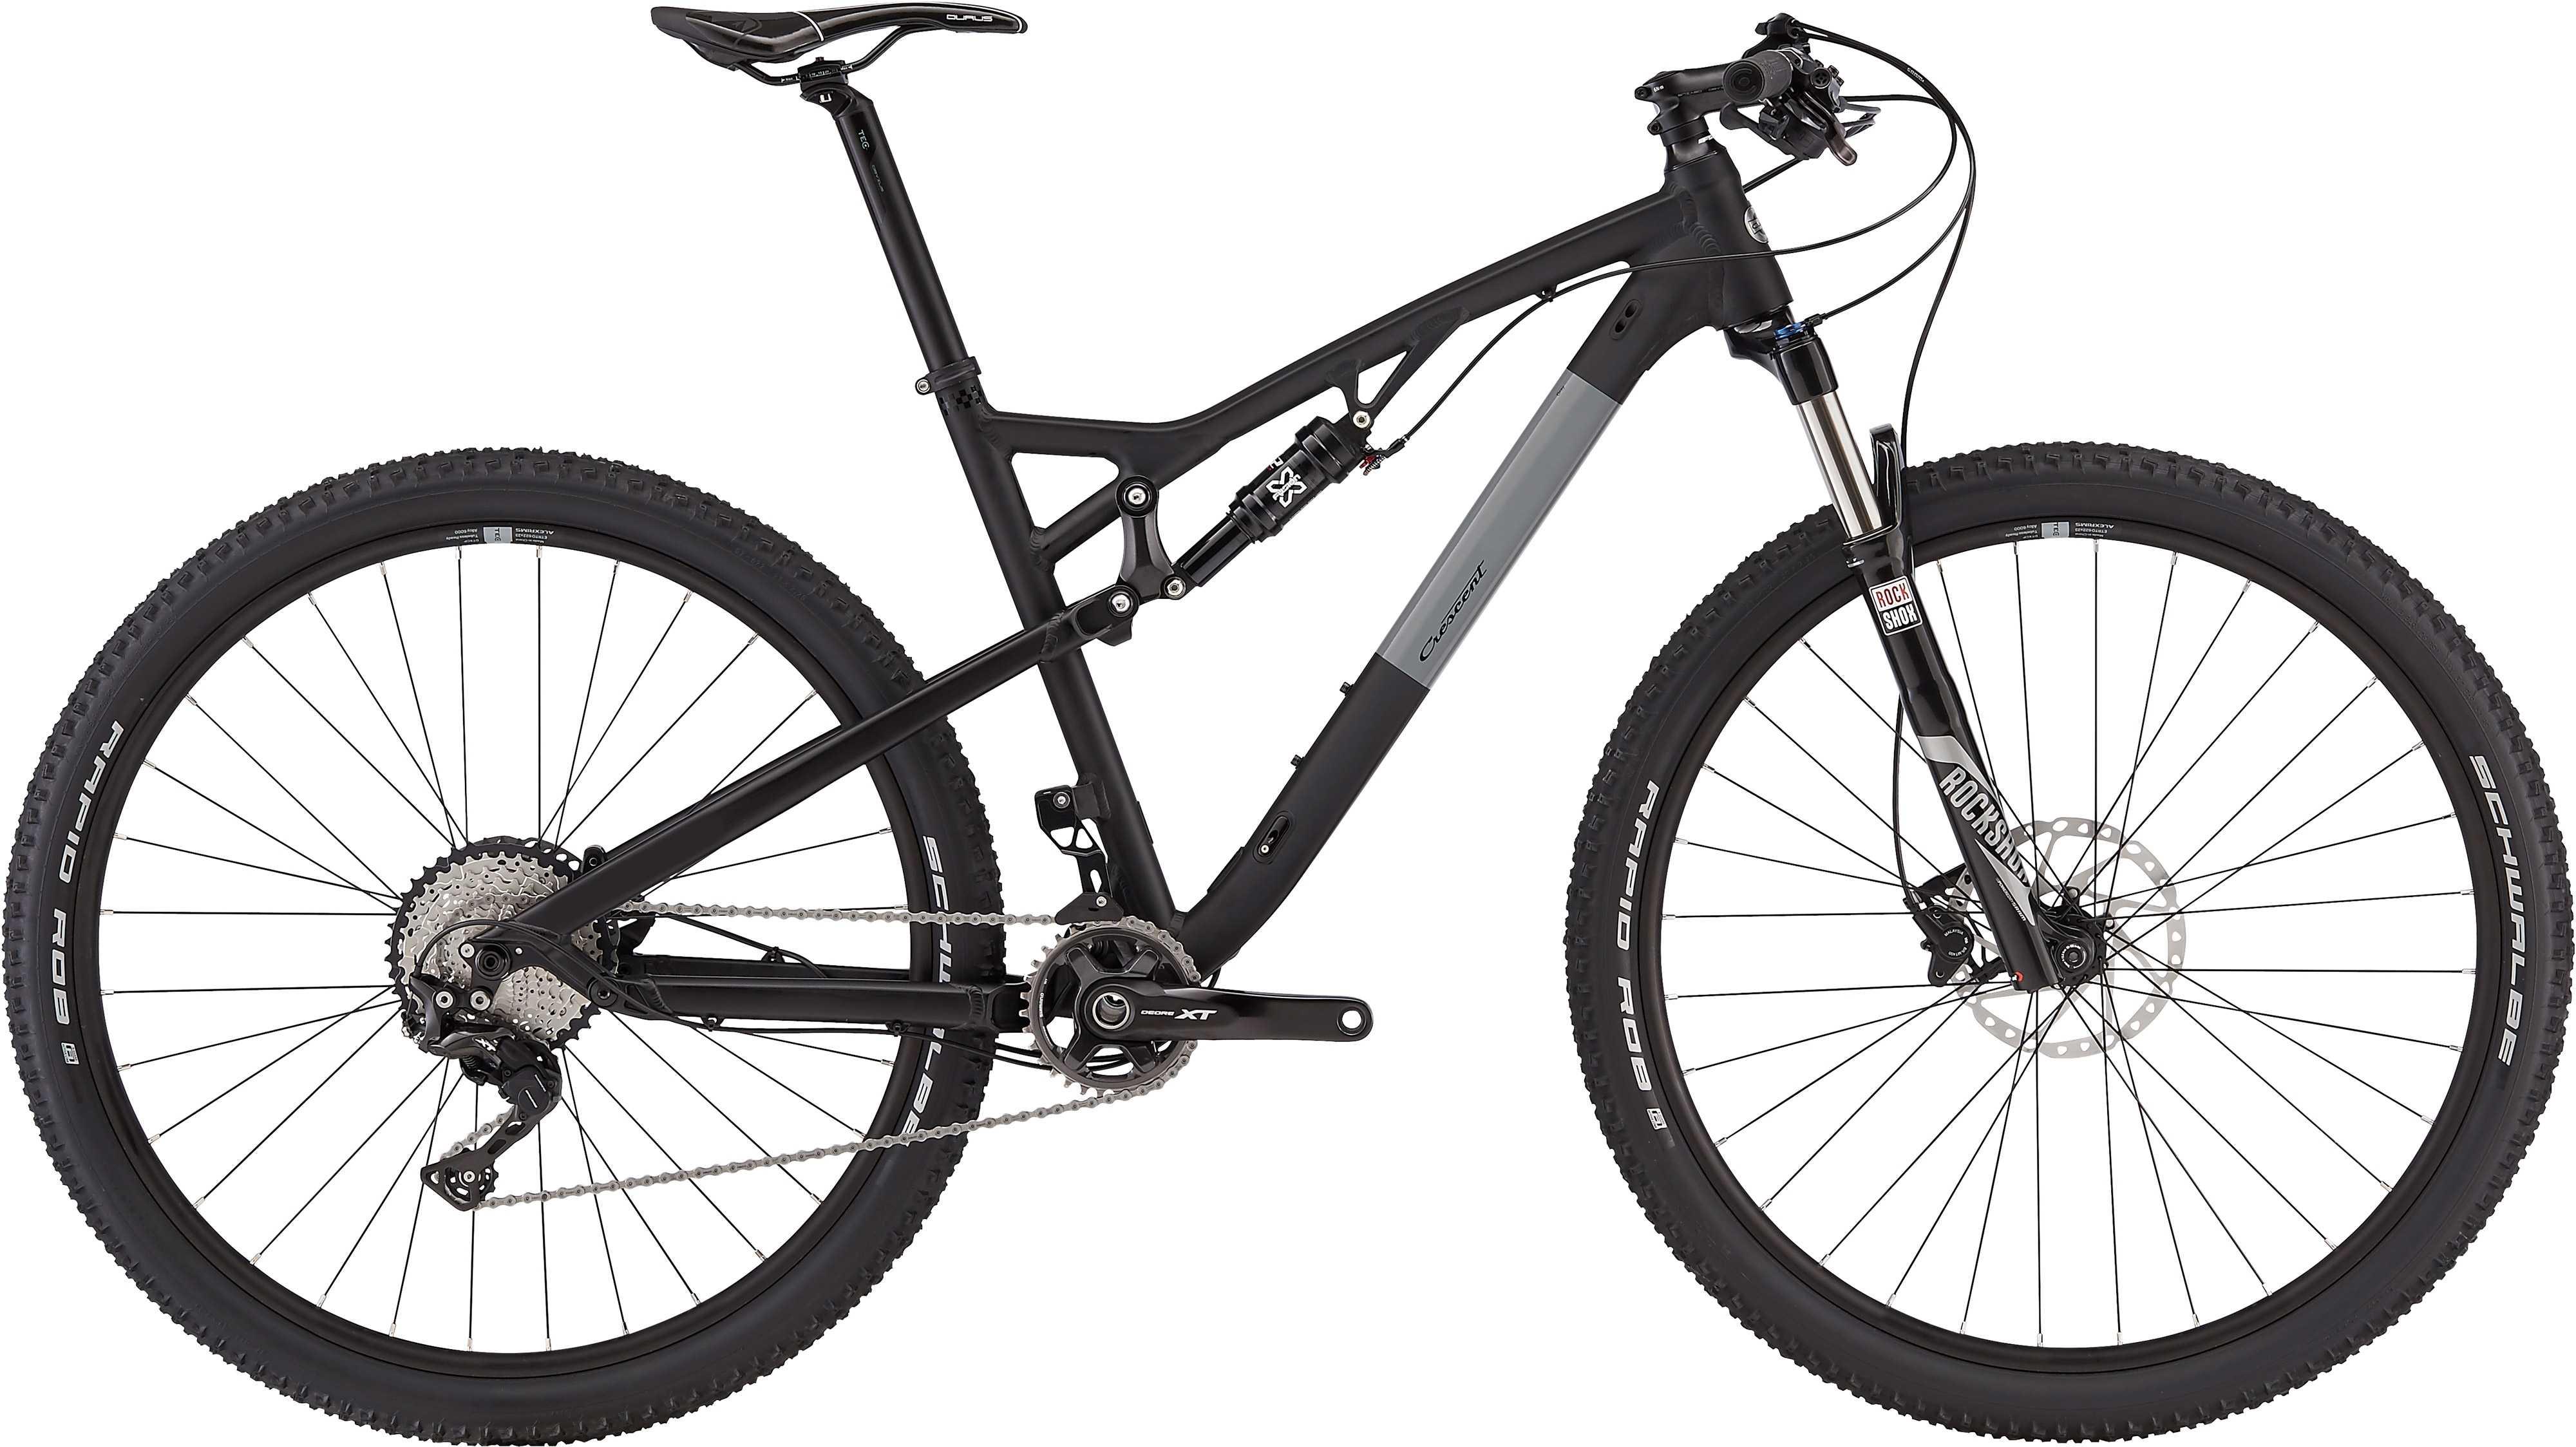 Crescent Stark S30 29 matt svart 48 cm